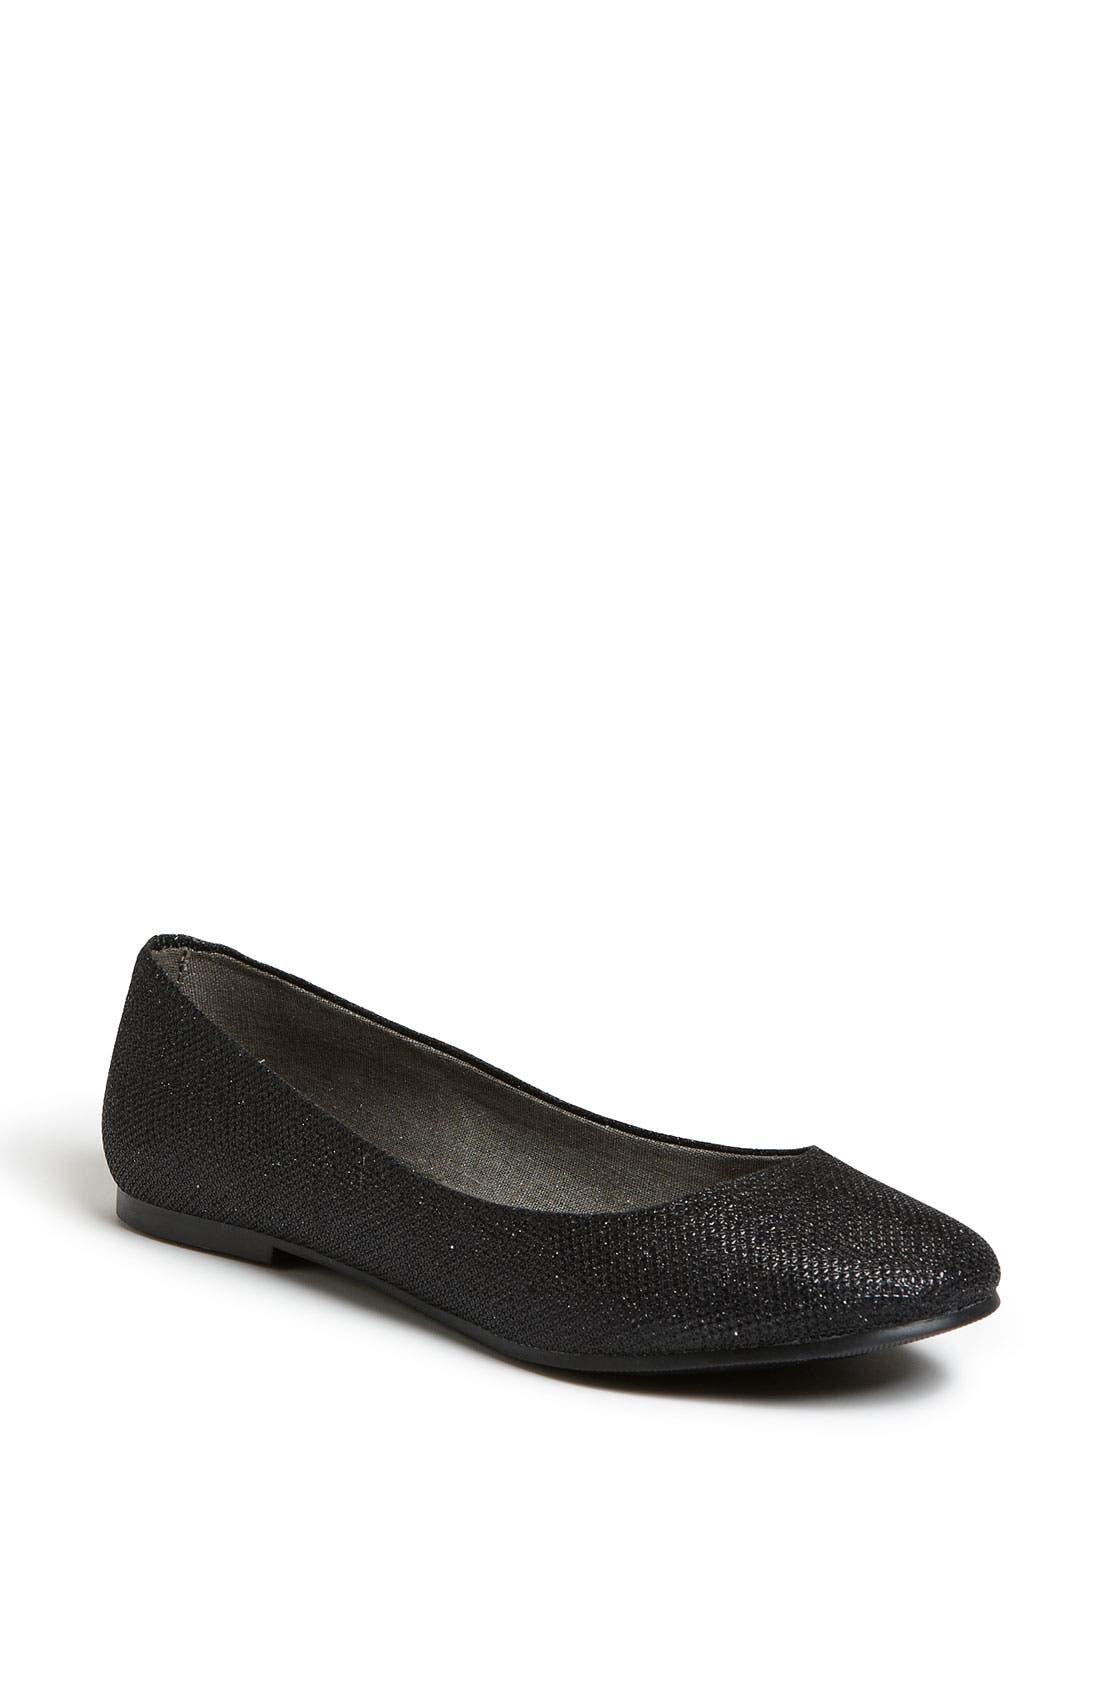 Main Image - BC Footwear 'Limousine' Mesh Flat